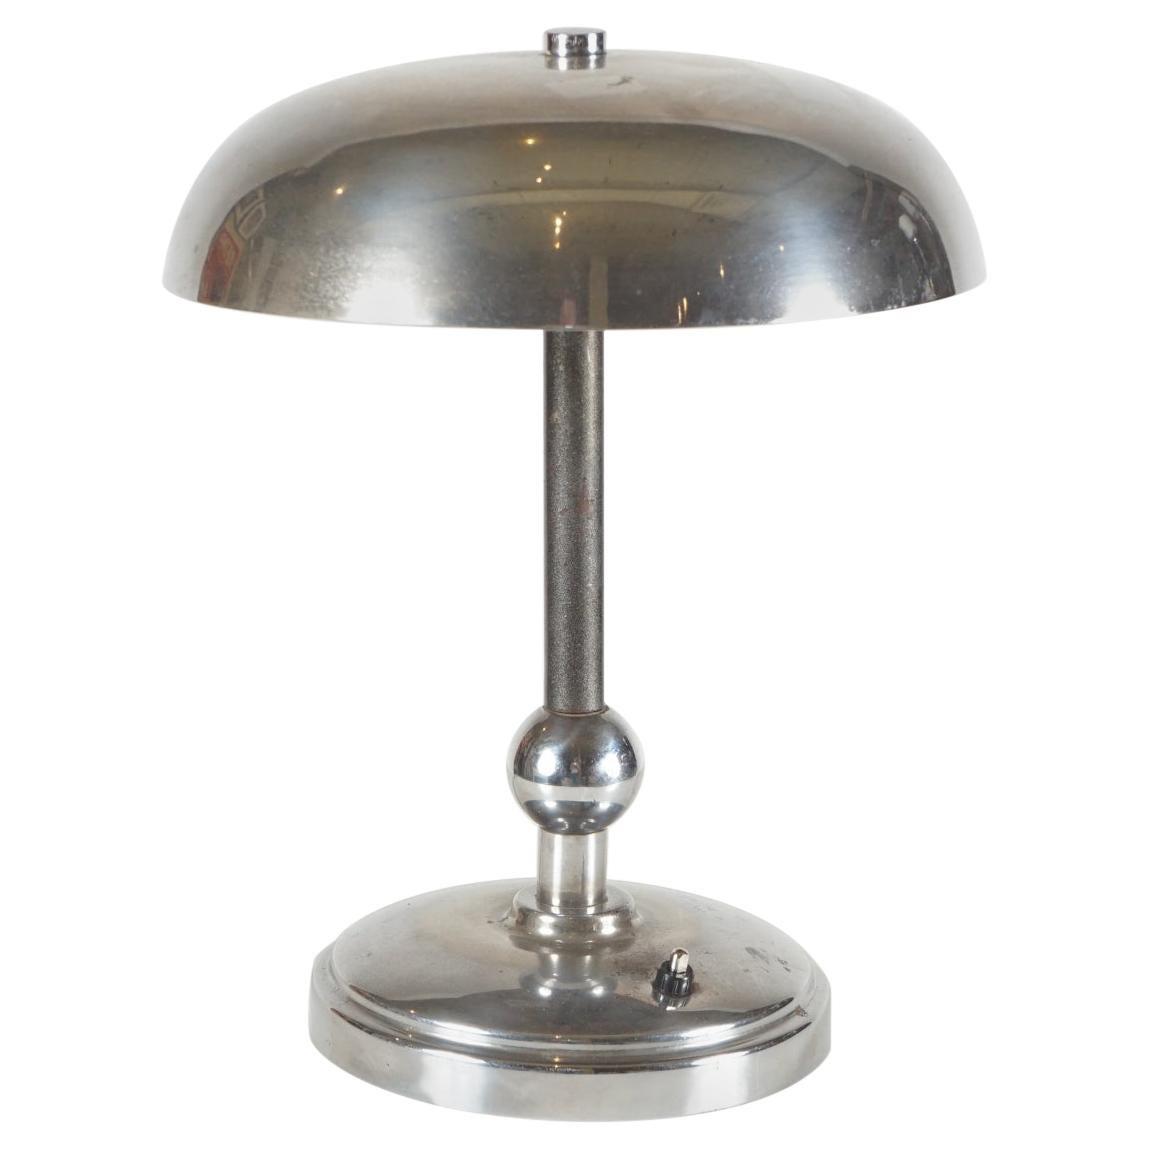 Art Deco Nickel-Plated Lamp